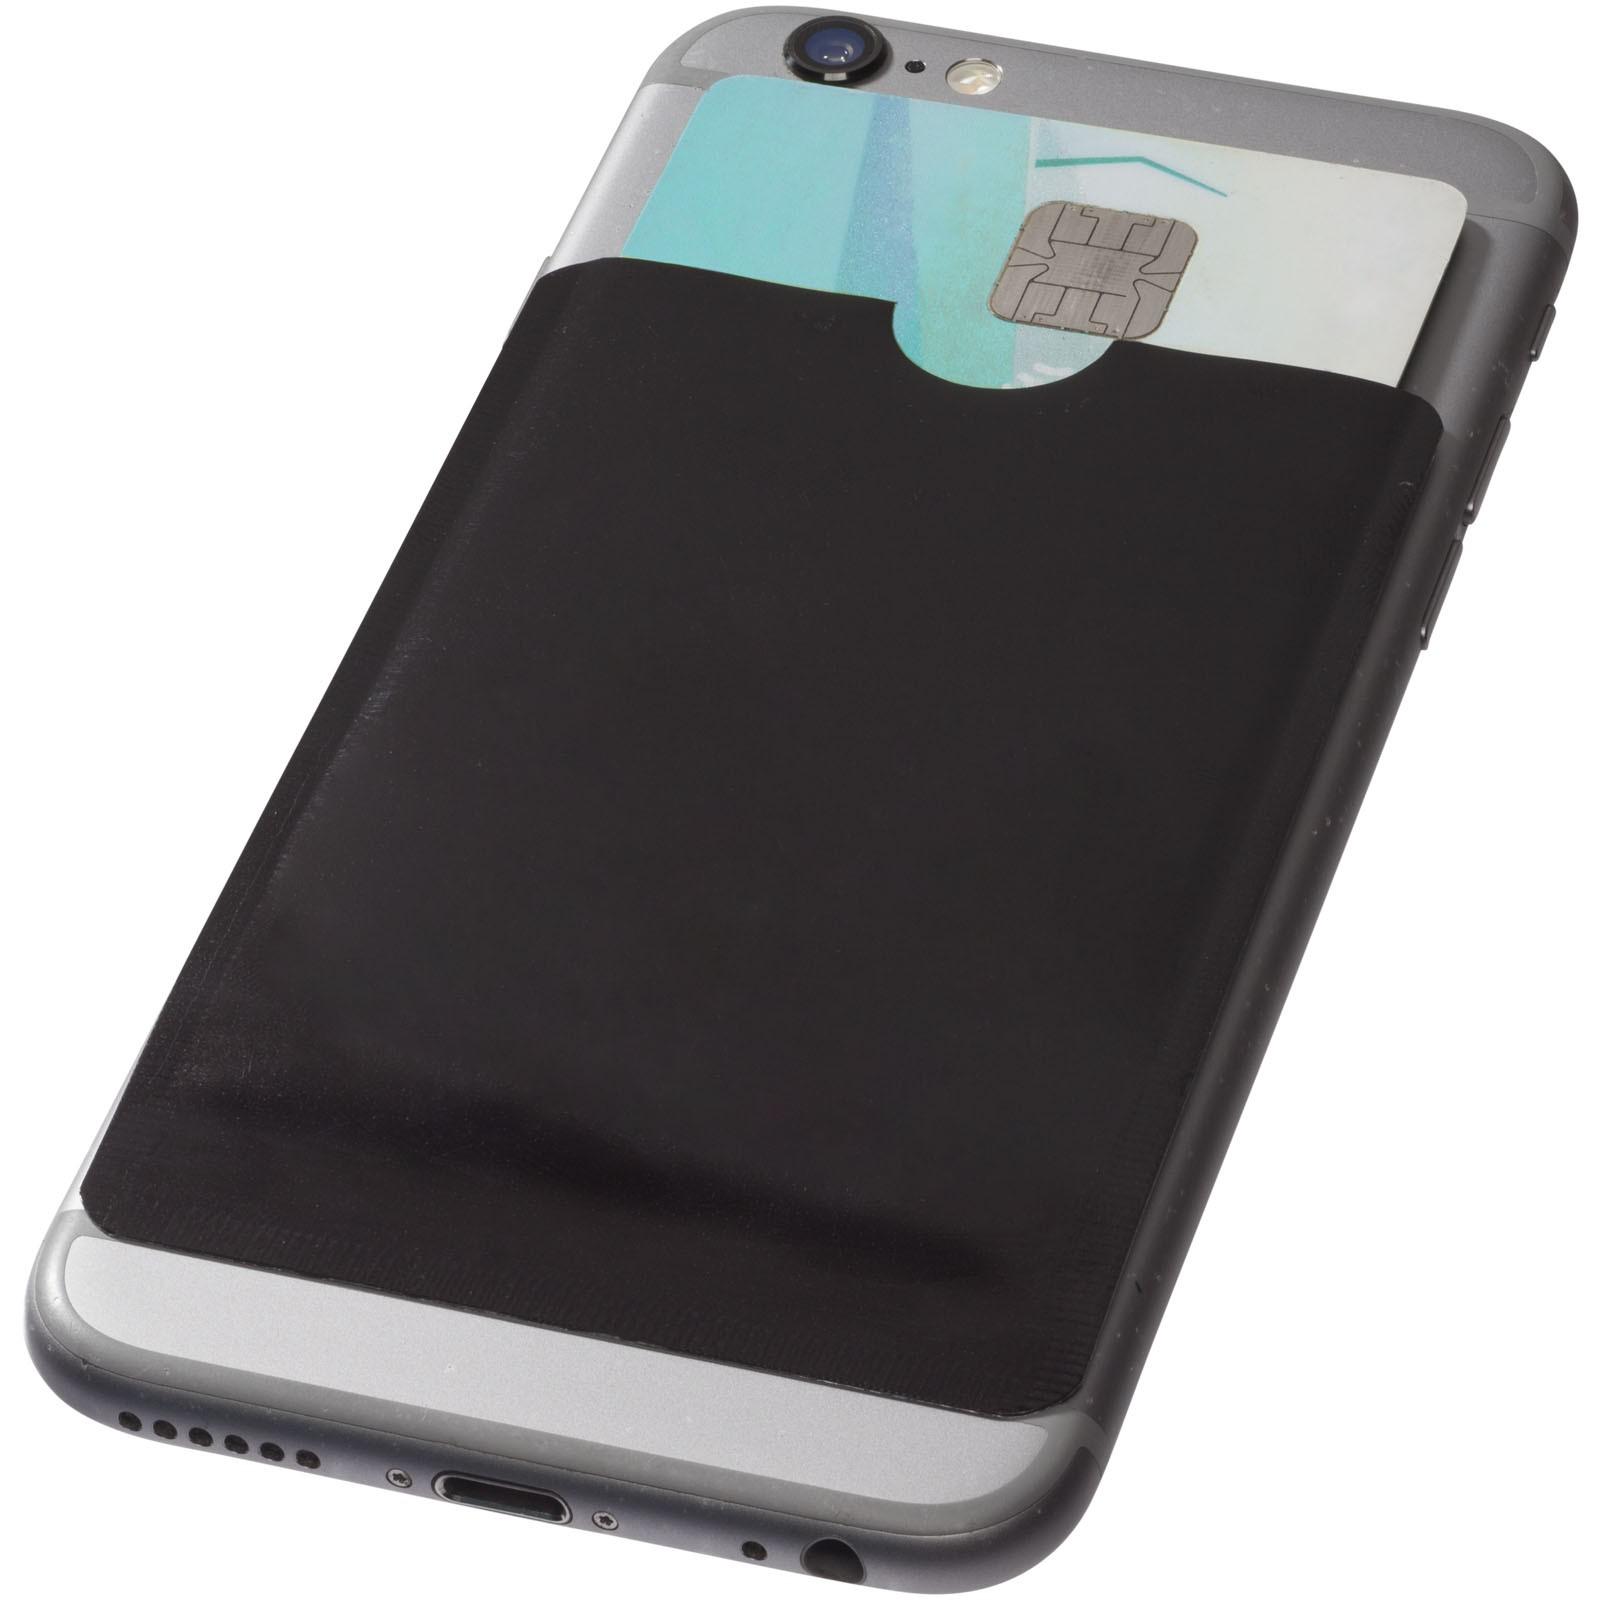 Pouzdro na karty RFID k chytrému telefonu - Černá